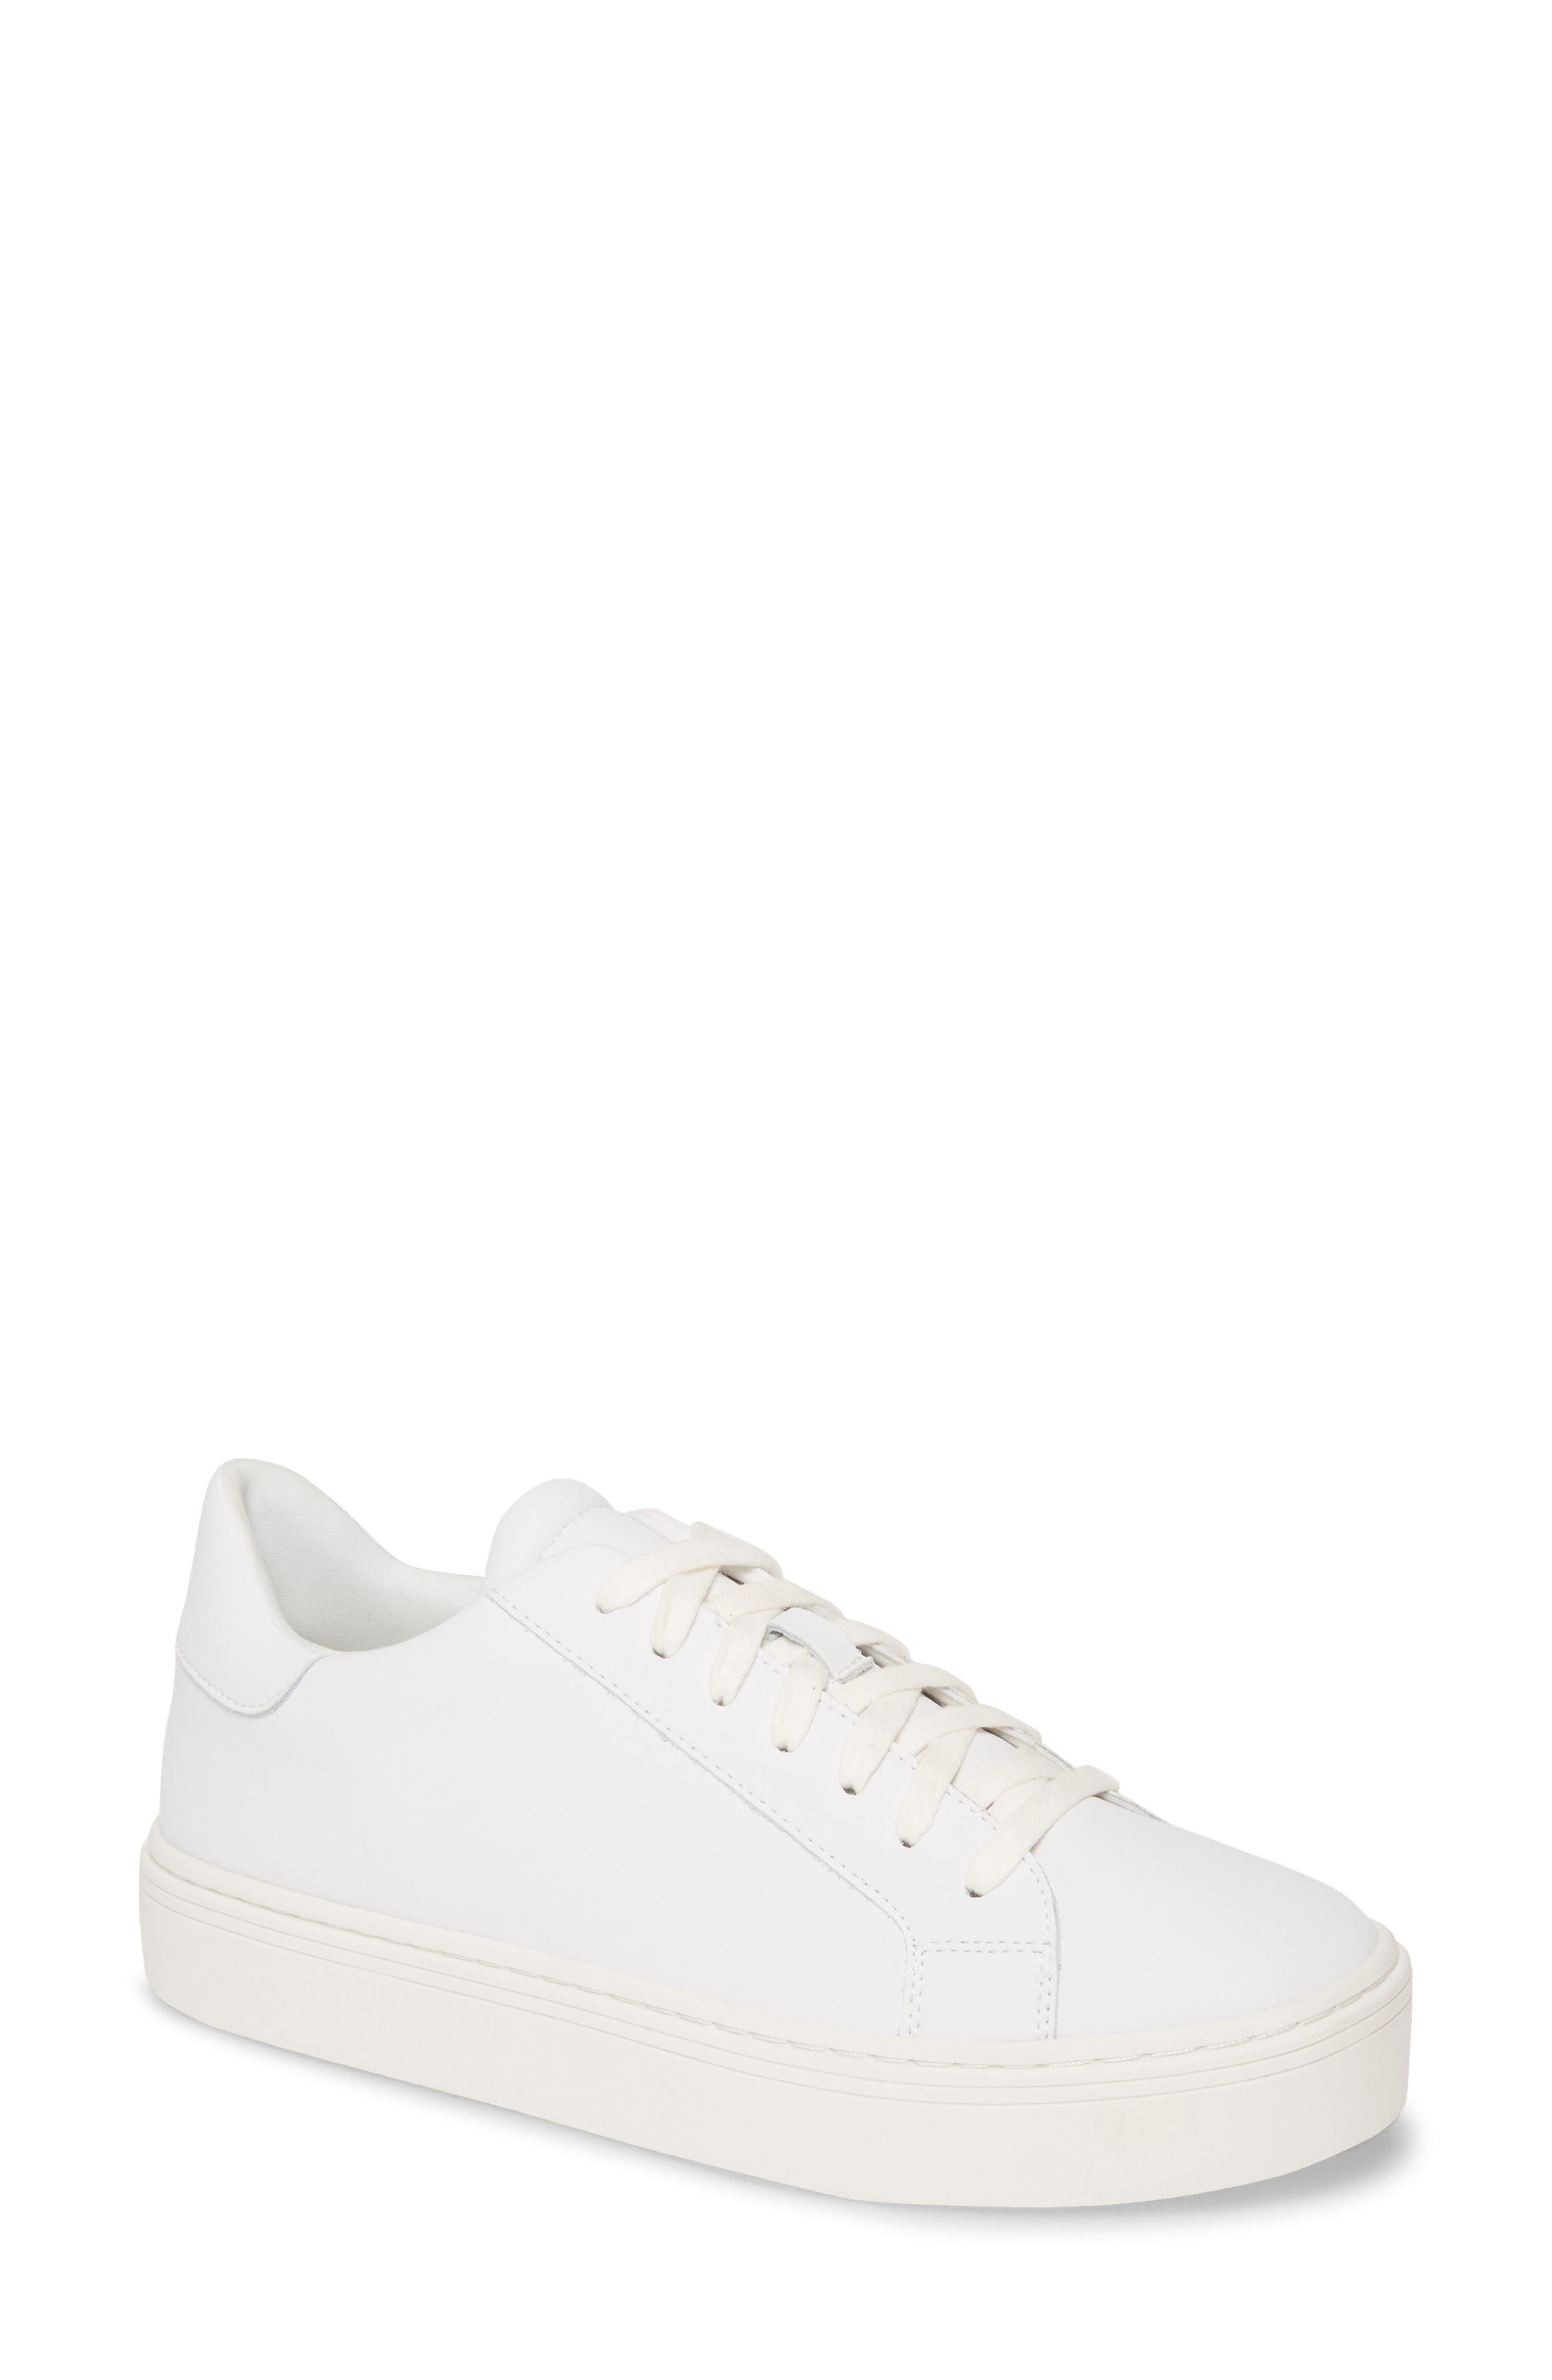 white platform sneakers nordstrom